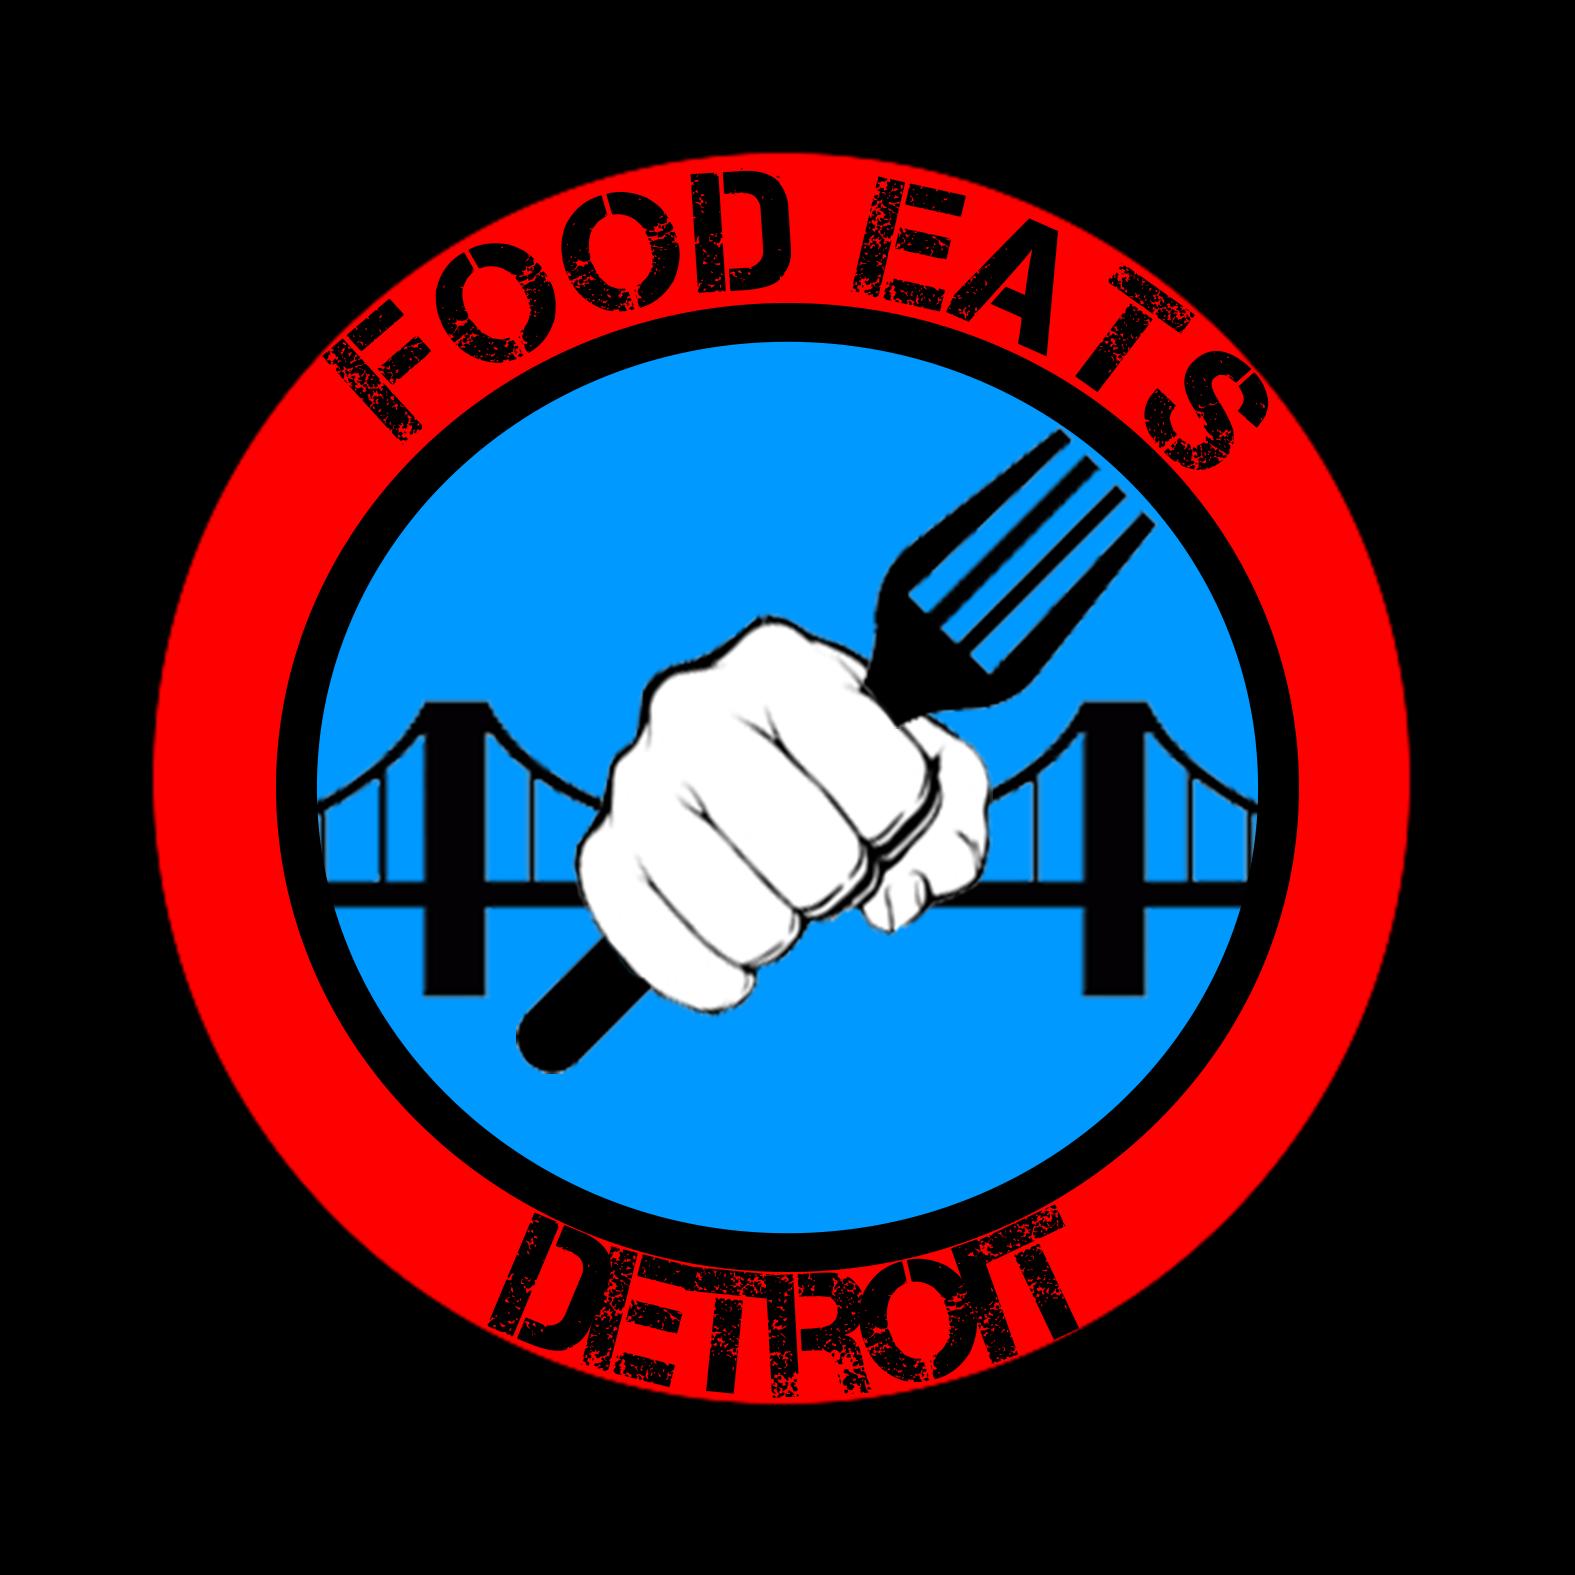 Food Eats Logo